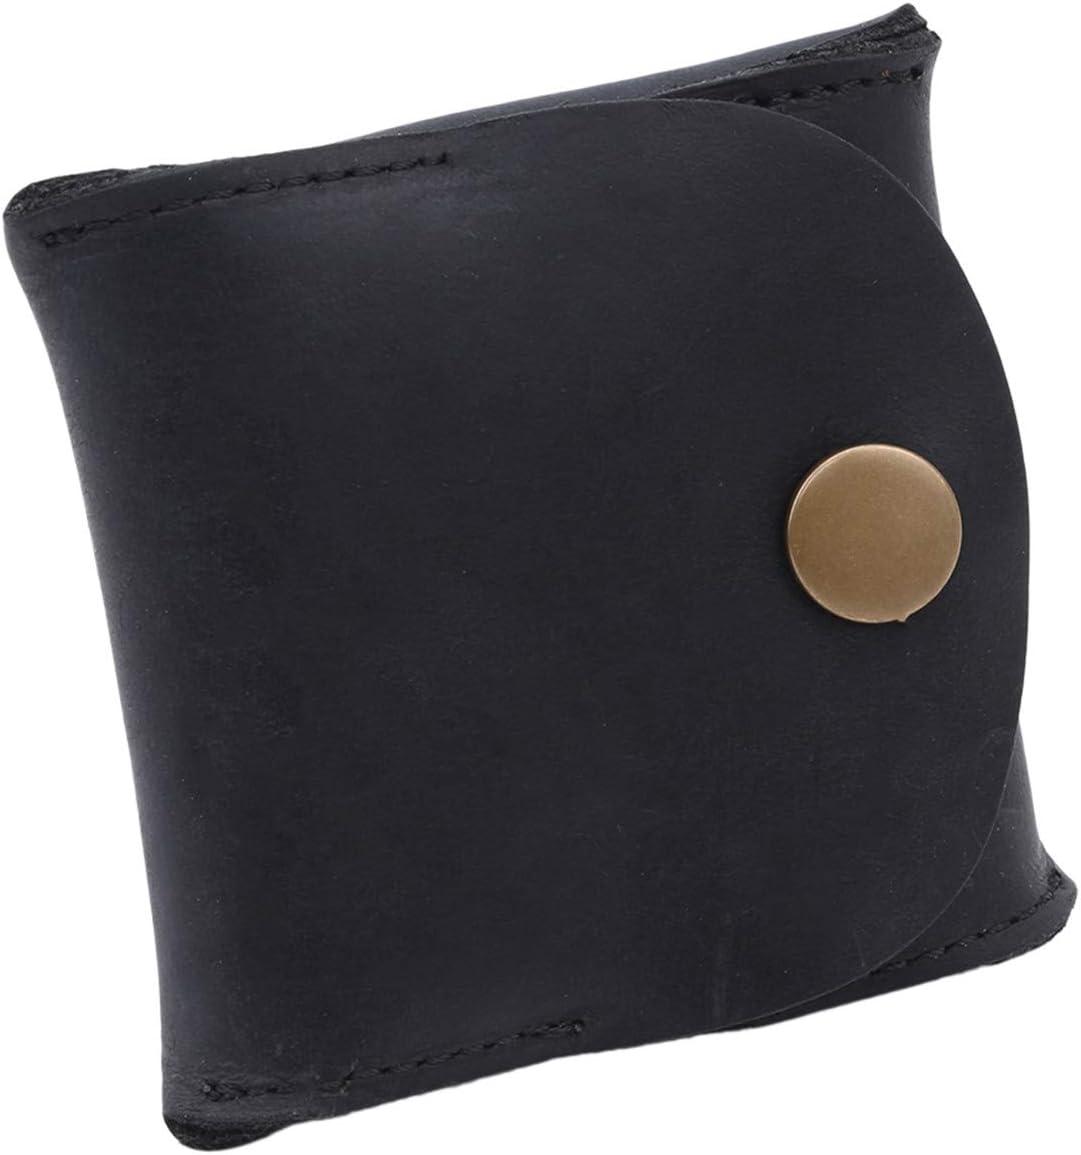 Bigsweety Men Leather Coin Pouch Purse Slim Cash Change Storage Coin Purse Wallet (Black)